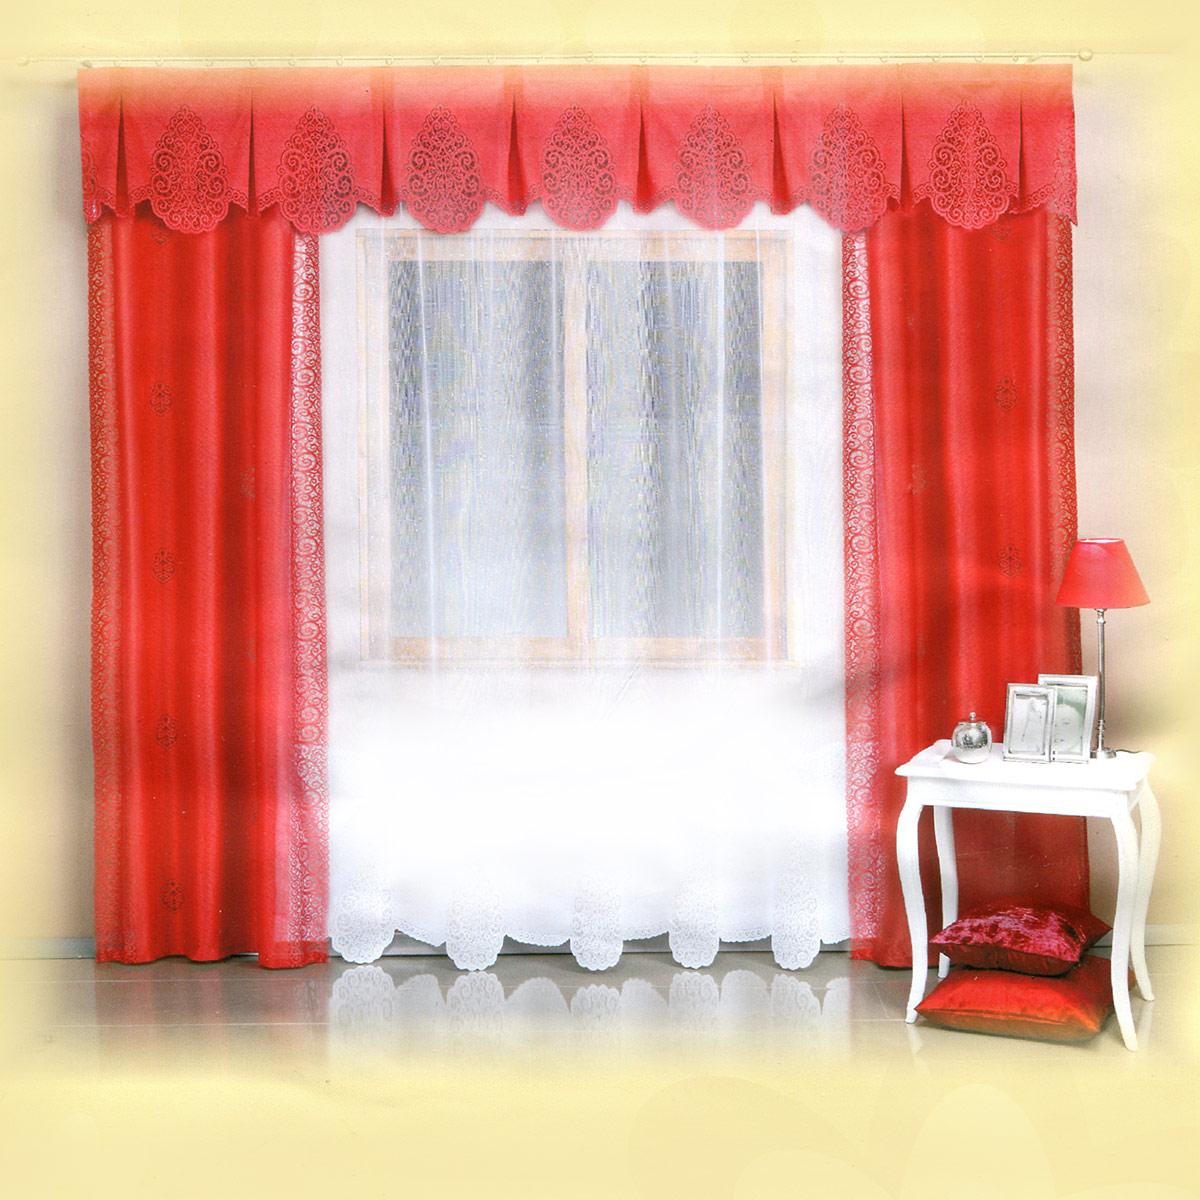 Комплект штор Wisan Wita, на ленте, цвет: алый, белый, высота 250 см комплект штор wisan lara на ленте цвет оранжевый белый высота 250 см